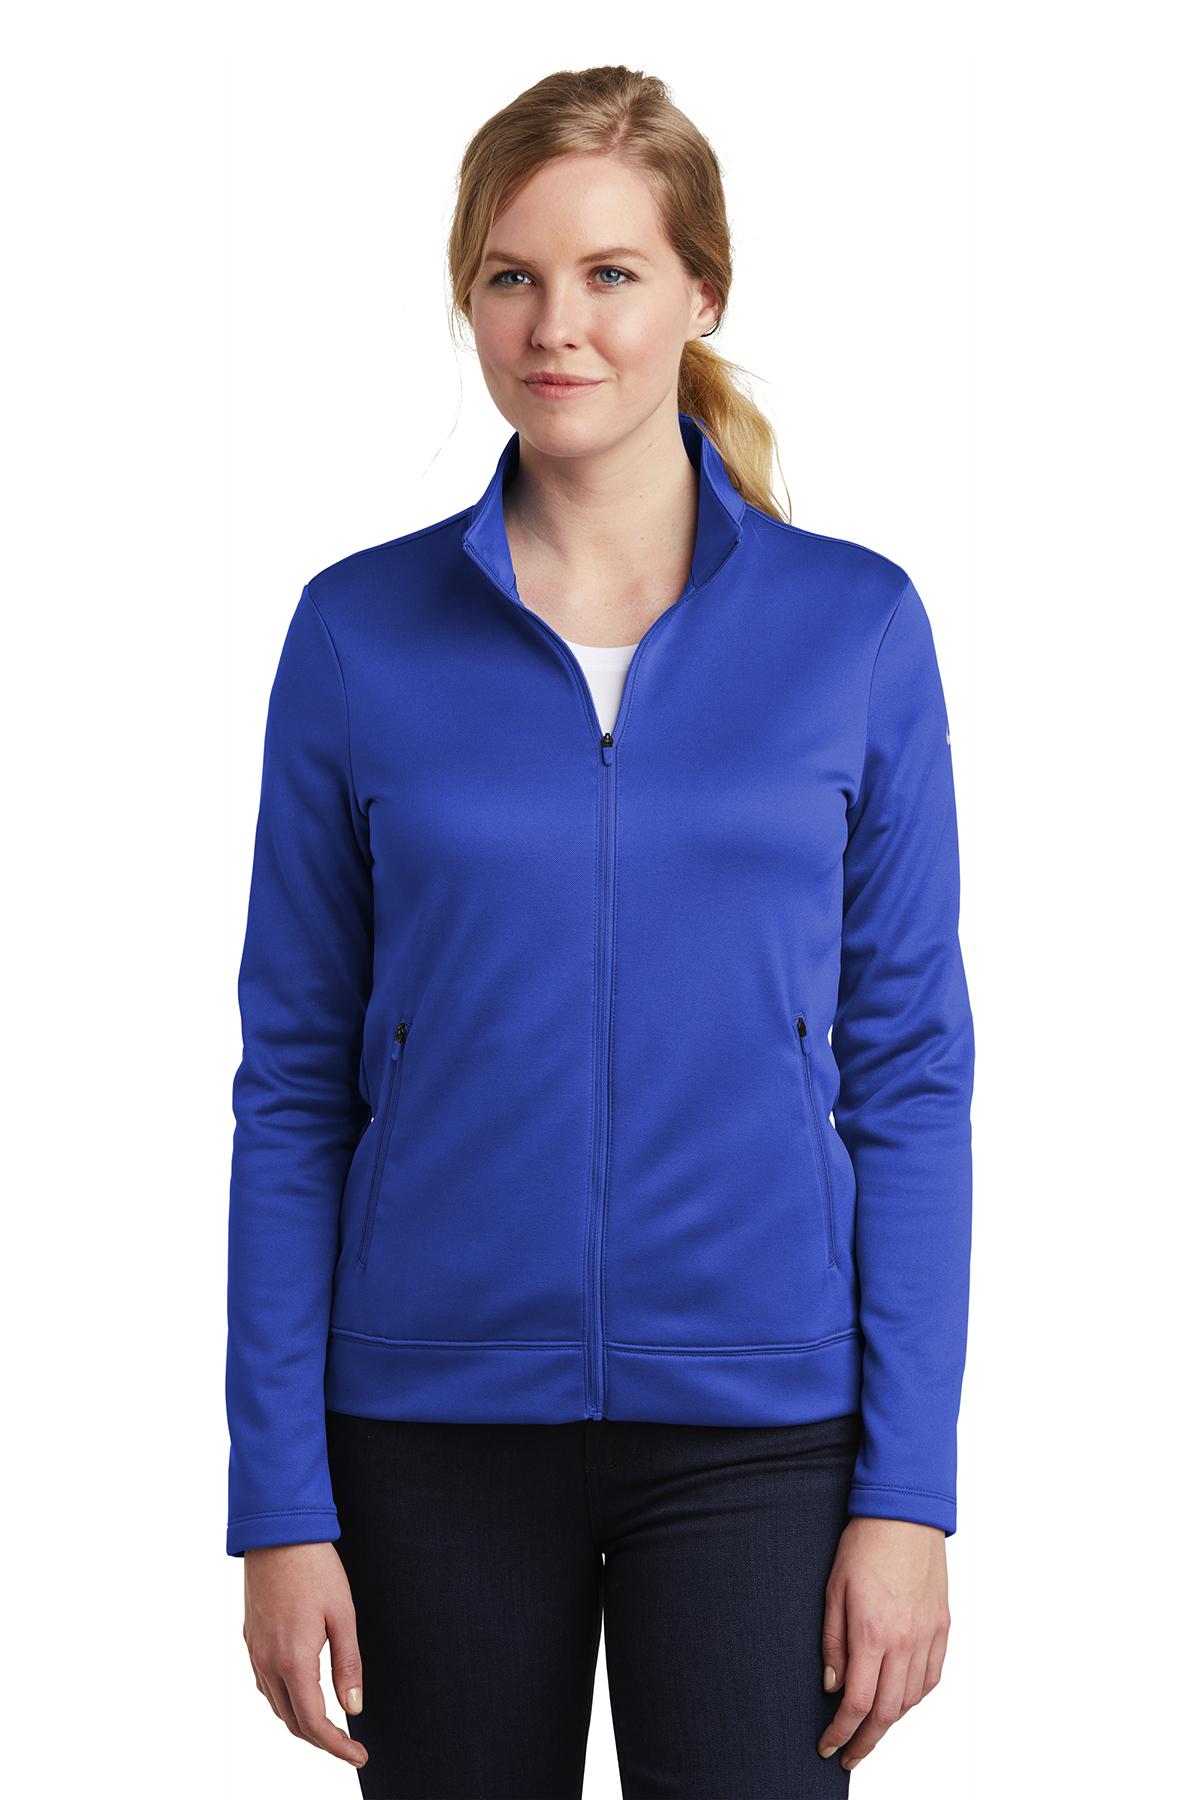 3239472f Nike Ladies Therma-FIT Full-Zip Fleece | Sweatshirts/Fleece | SanMar